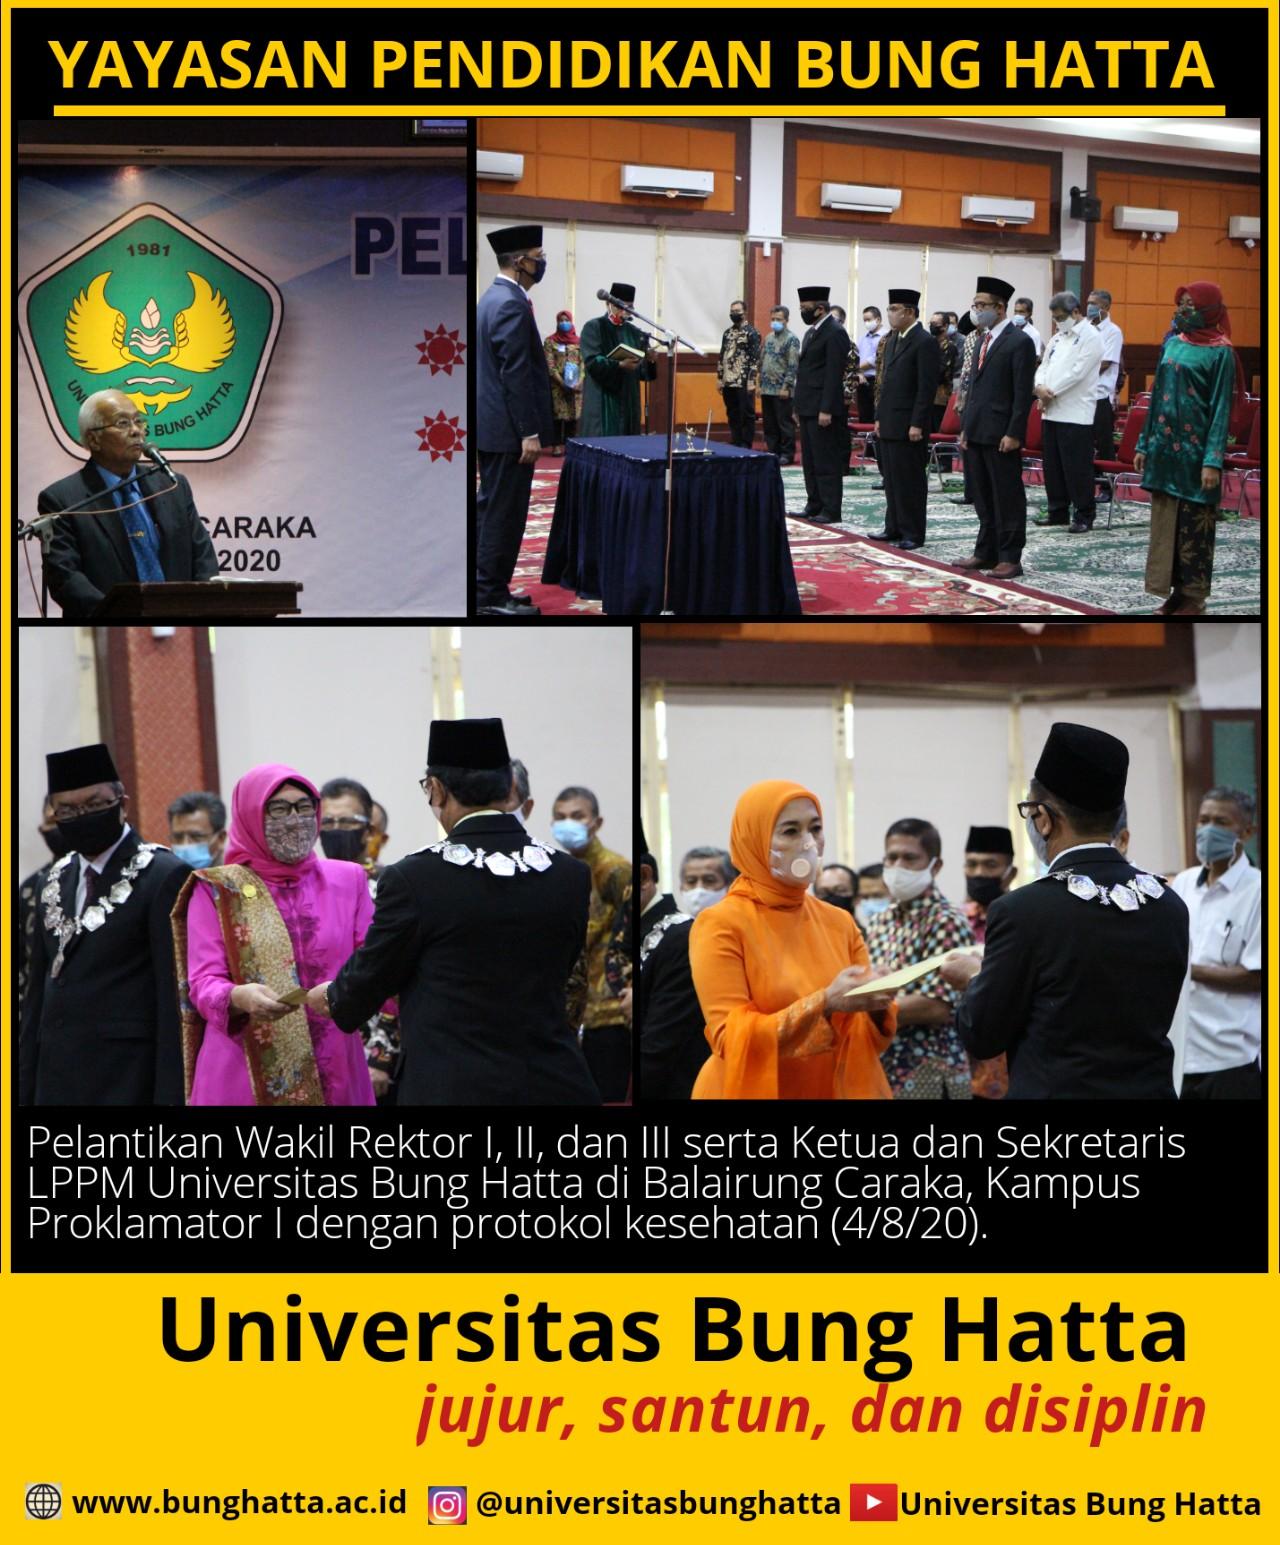 Pelantikan Wakil Rektor I, II, dan III Universitas Bung Hatta